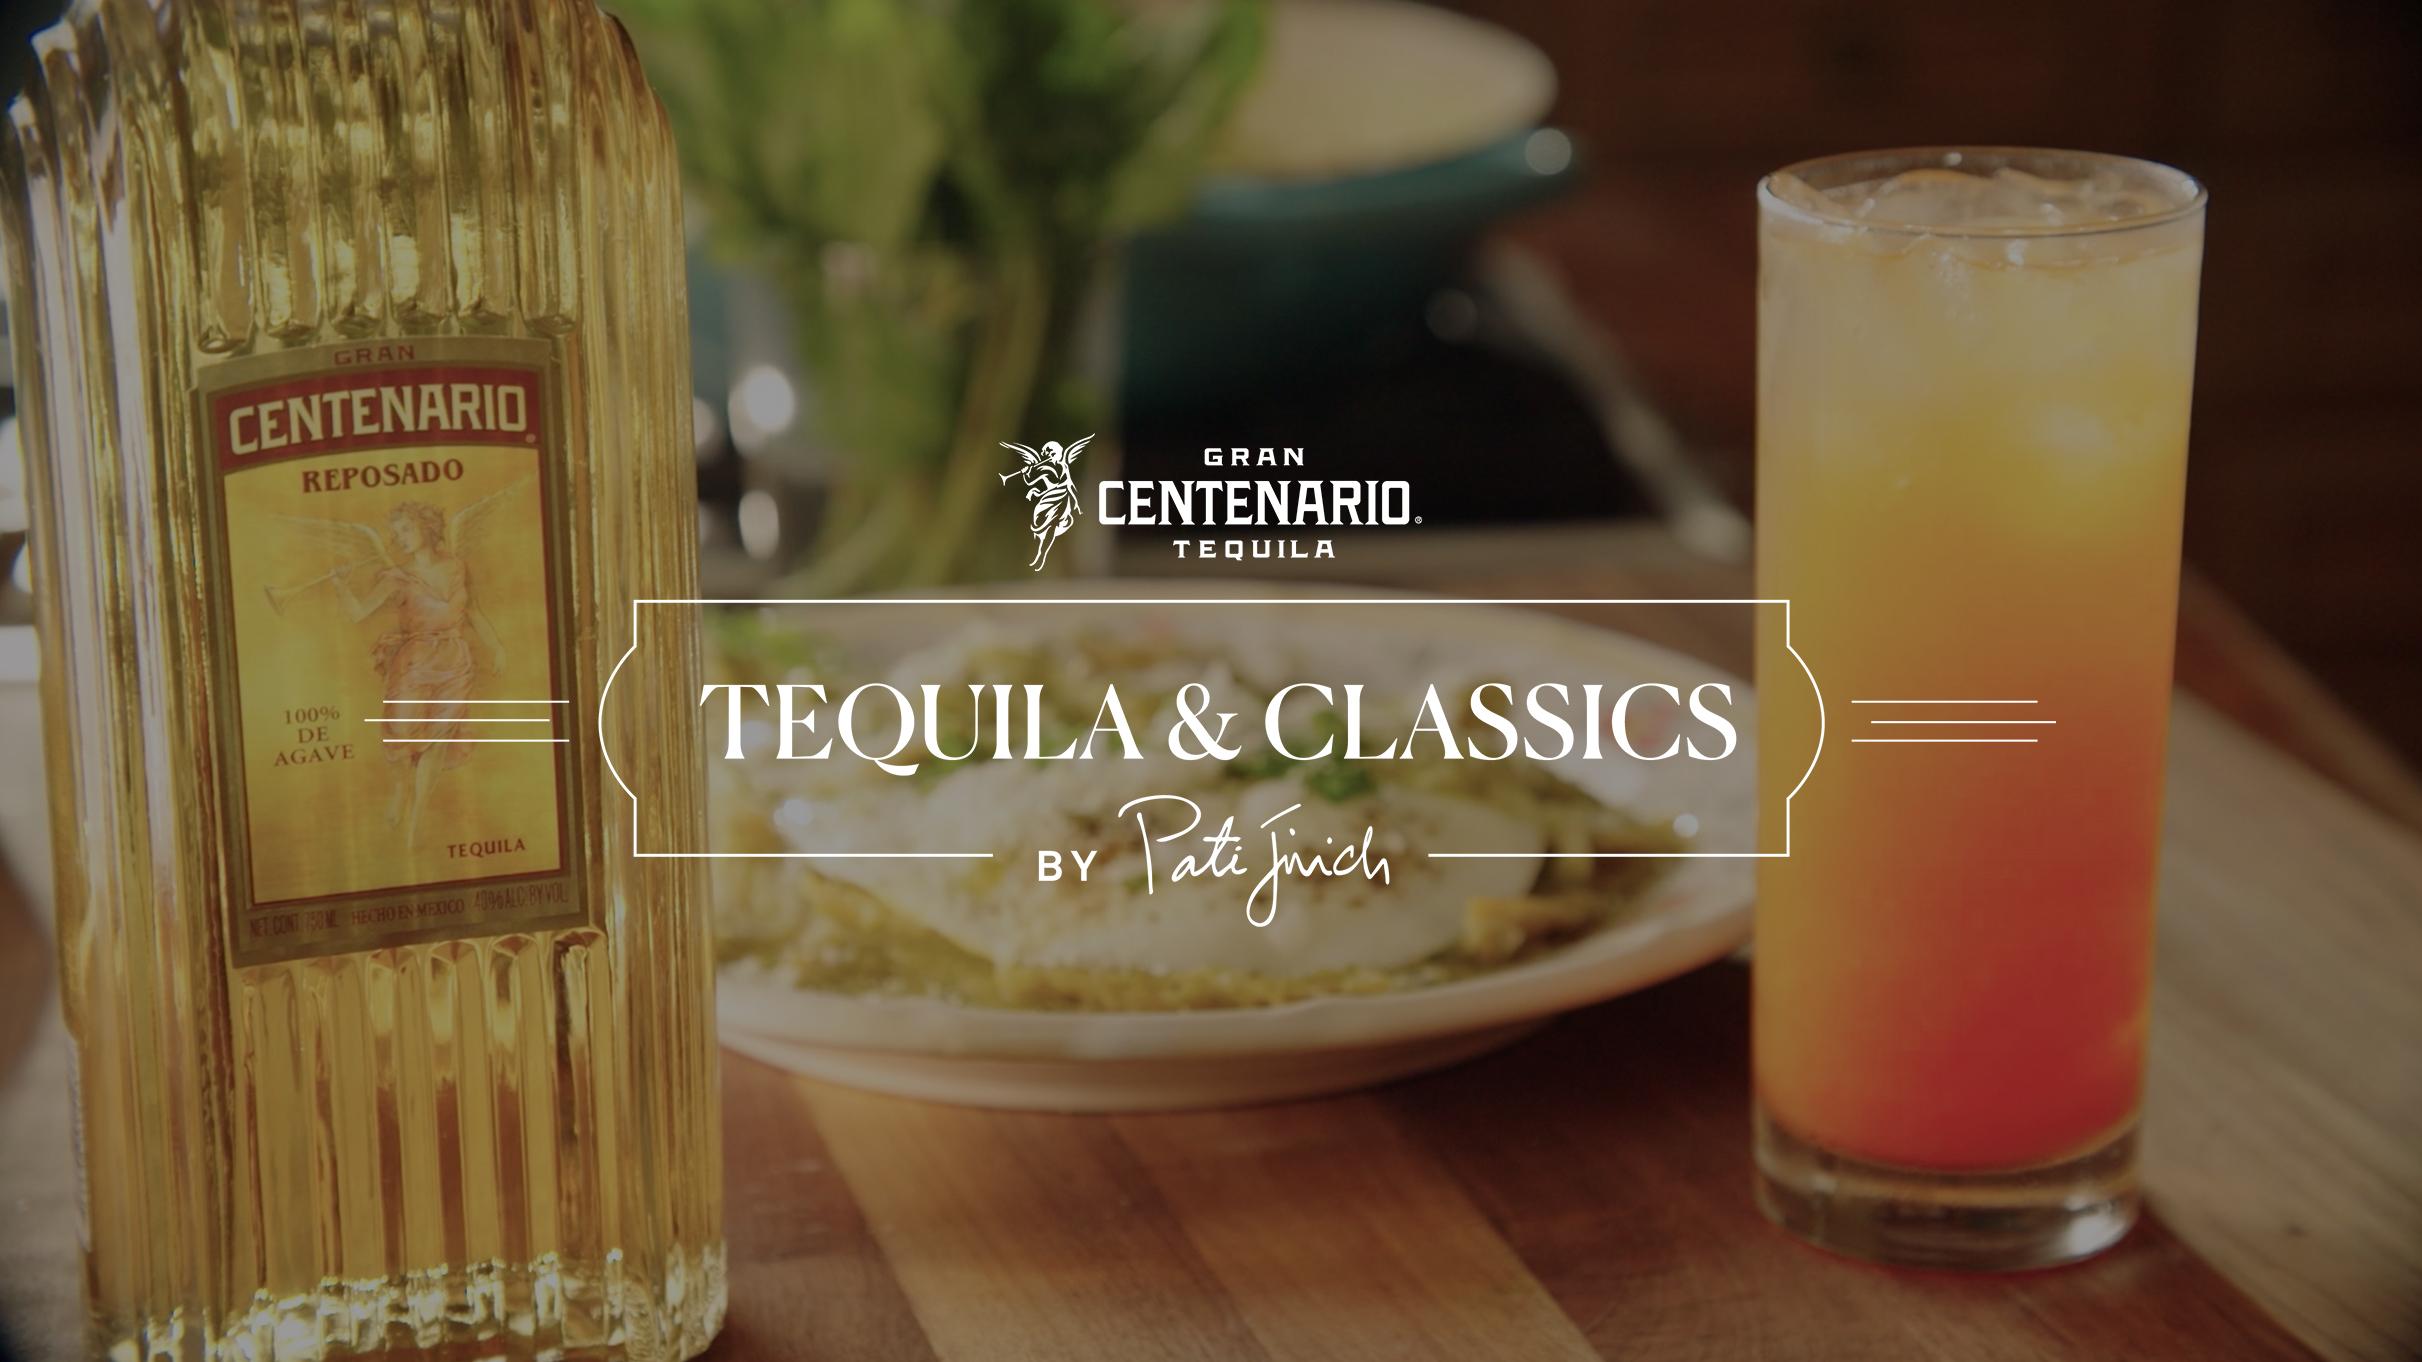 Tequila & Classics Episodio 2